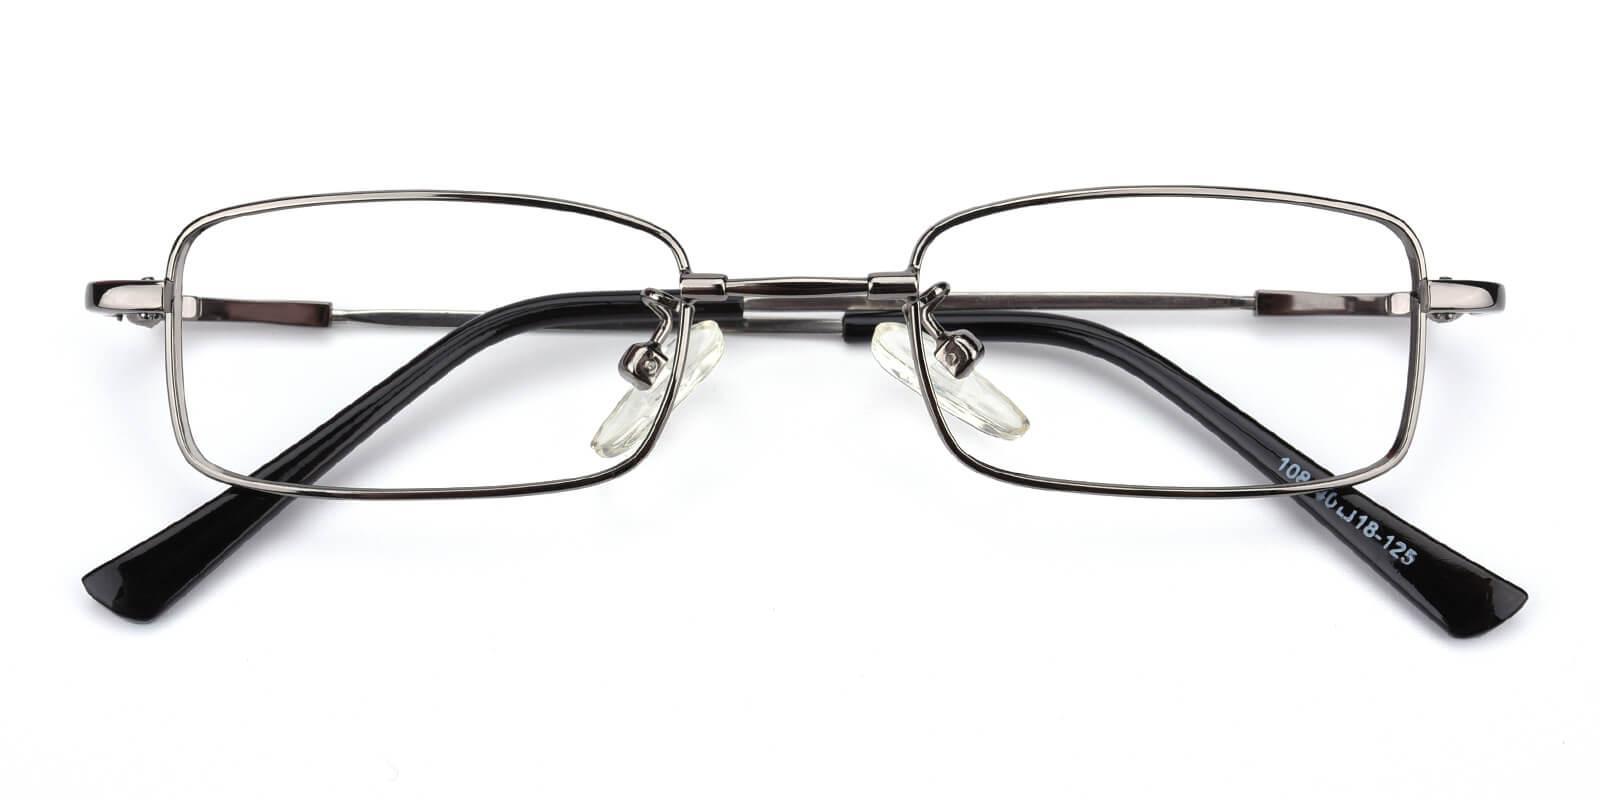 Lanscripe-Gun-Rectangle-Titanium-Eyeglasses-detail